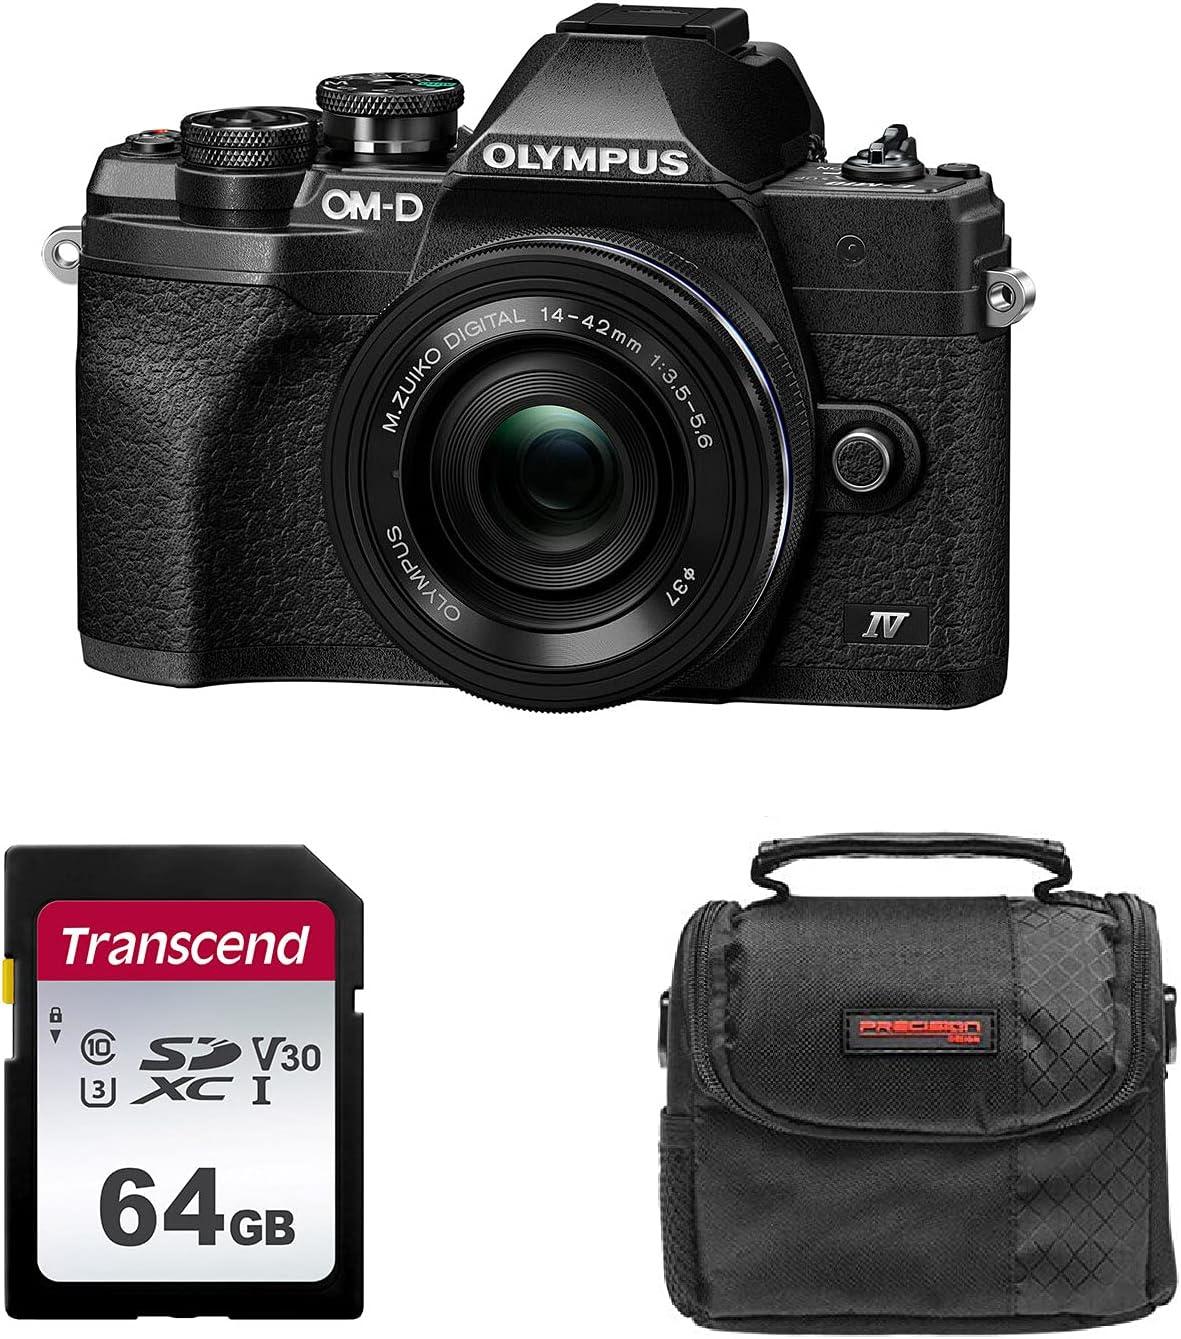 Olympus OM-D E-M10 Mark IV Digital 14-42m with Max 67% OFF Mirrorless Camera 35% OFF